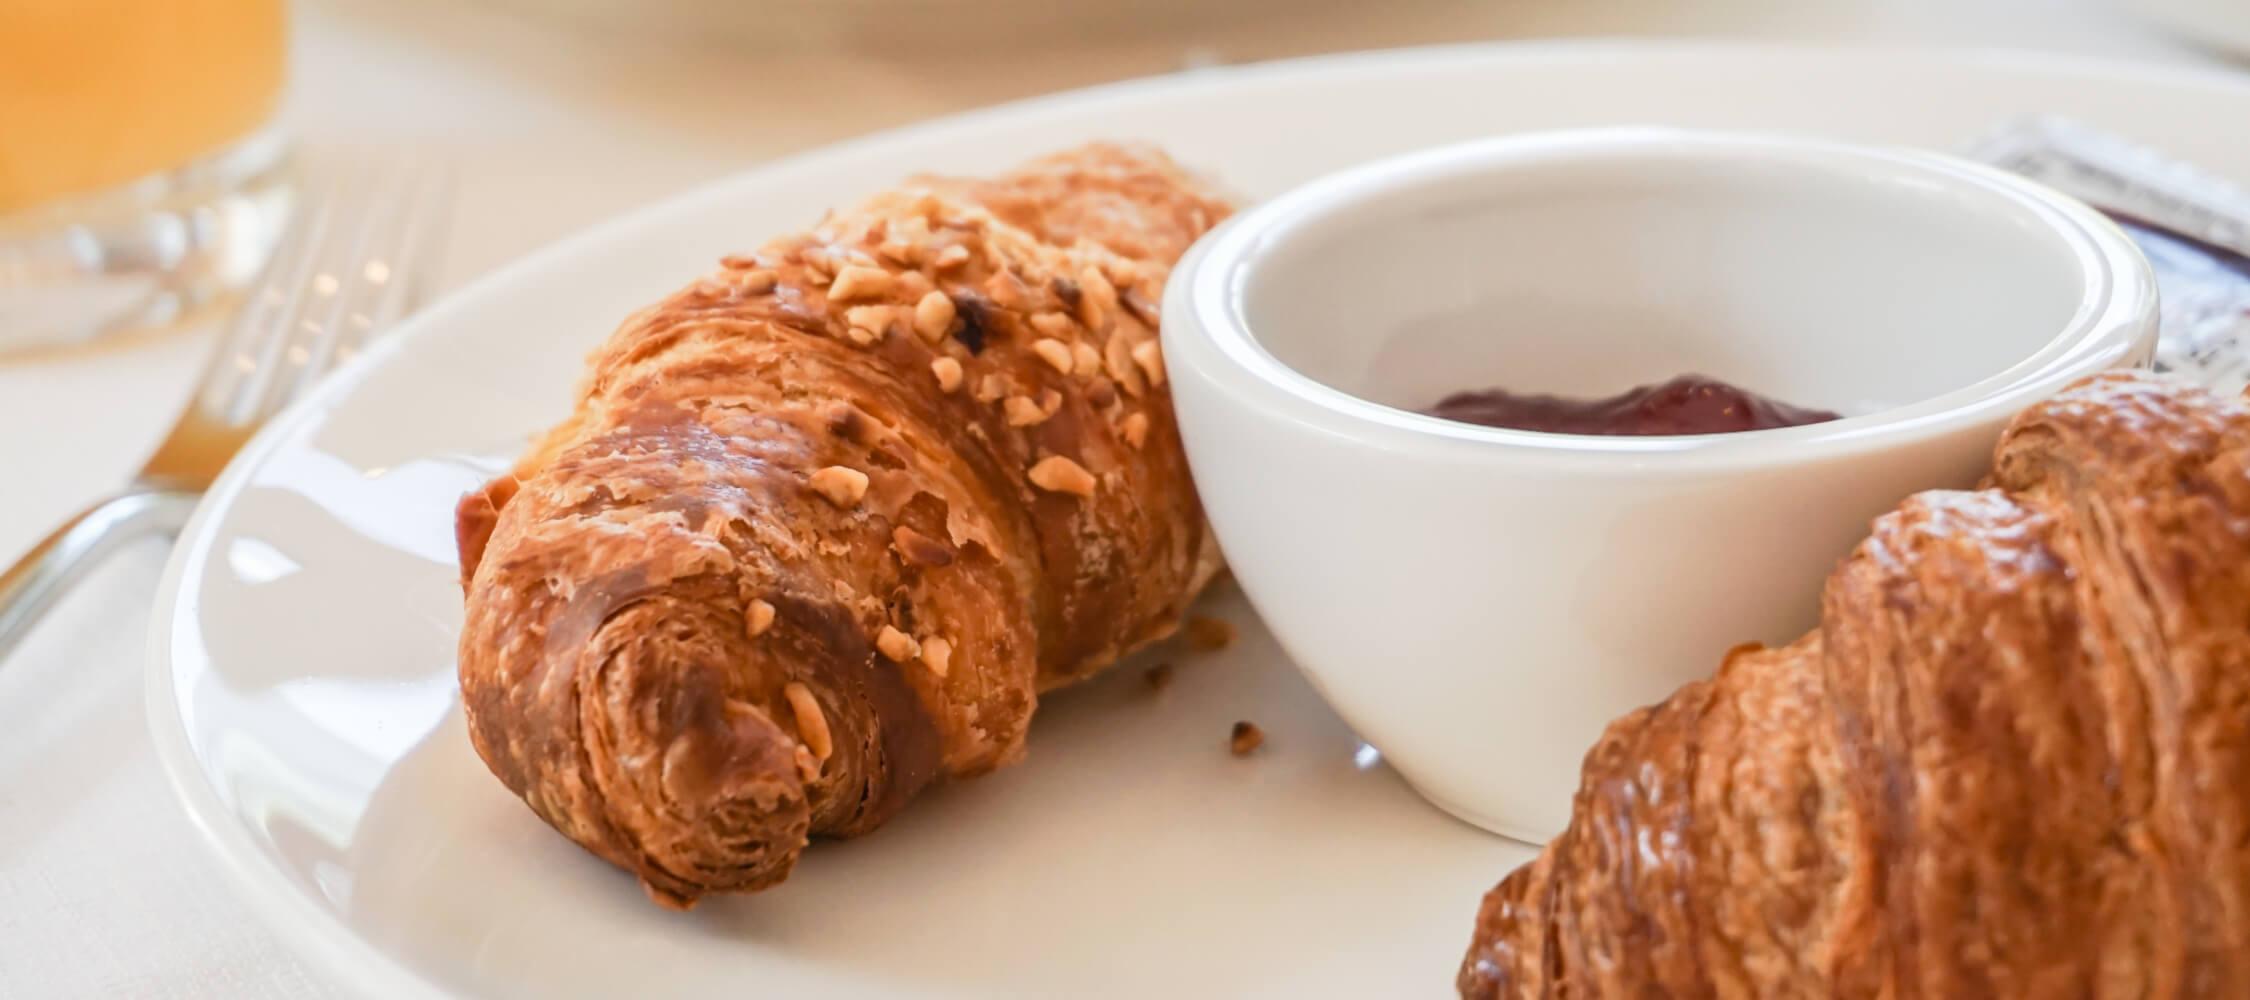 Hotel-Villa-Laurus-Merano-Restaurant-Breakfast-Buffet-Fruehstueck-Food-Sweets-Brioche-Anguane-05994-2250x1000